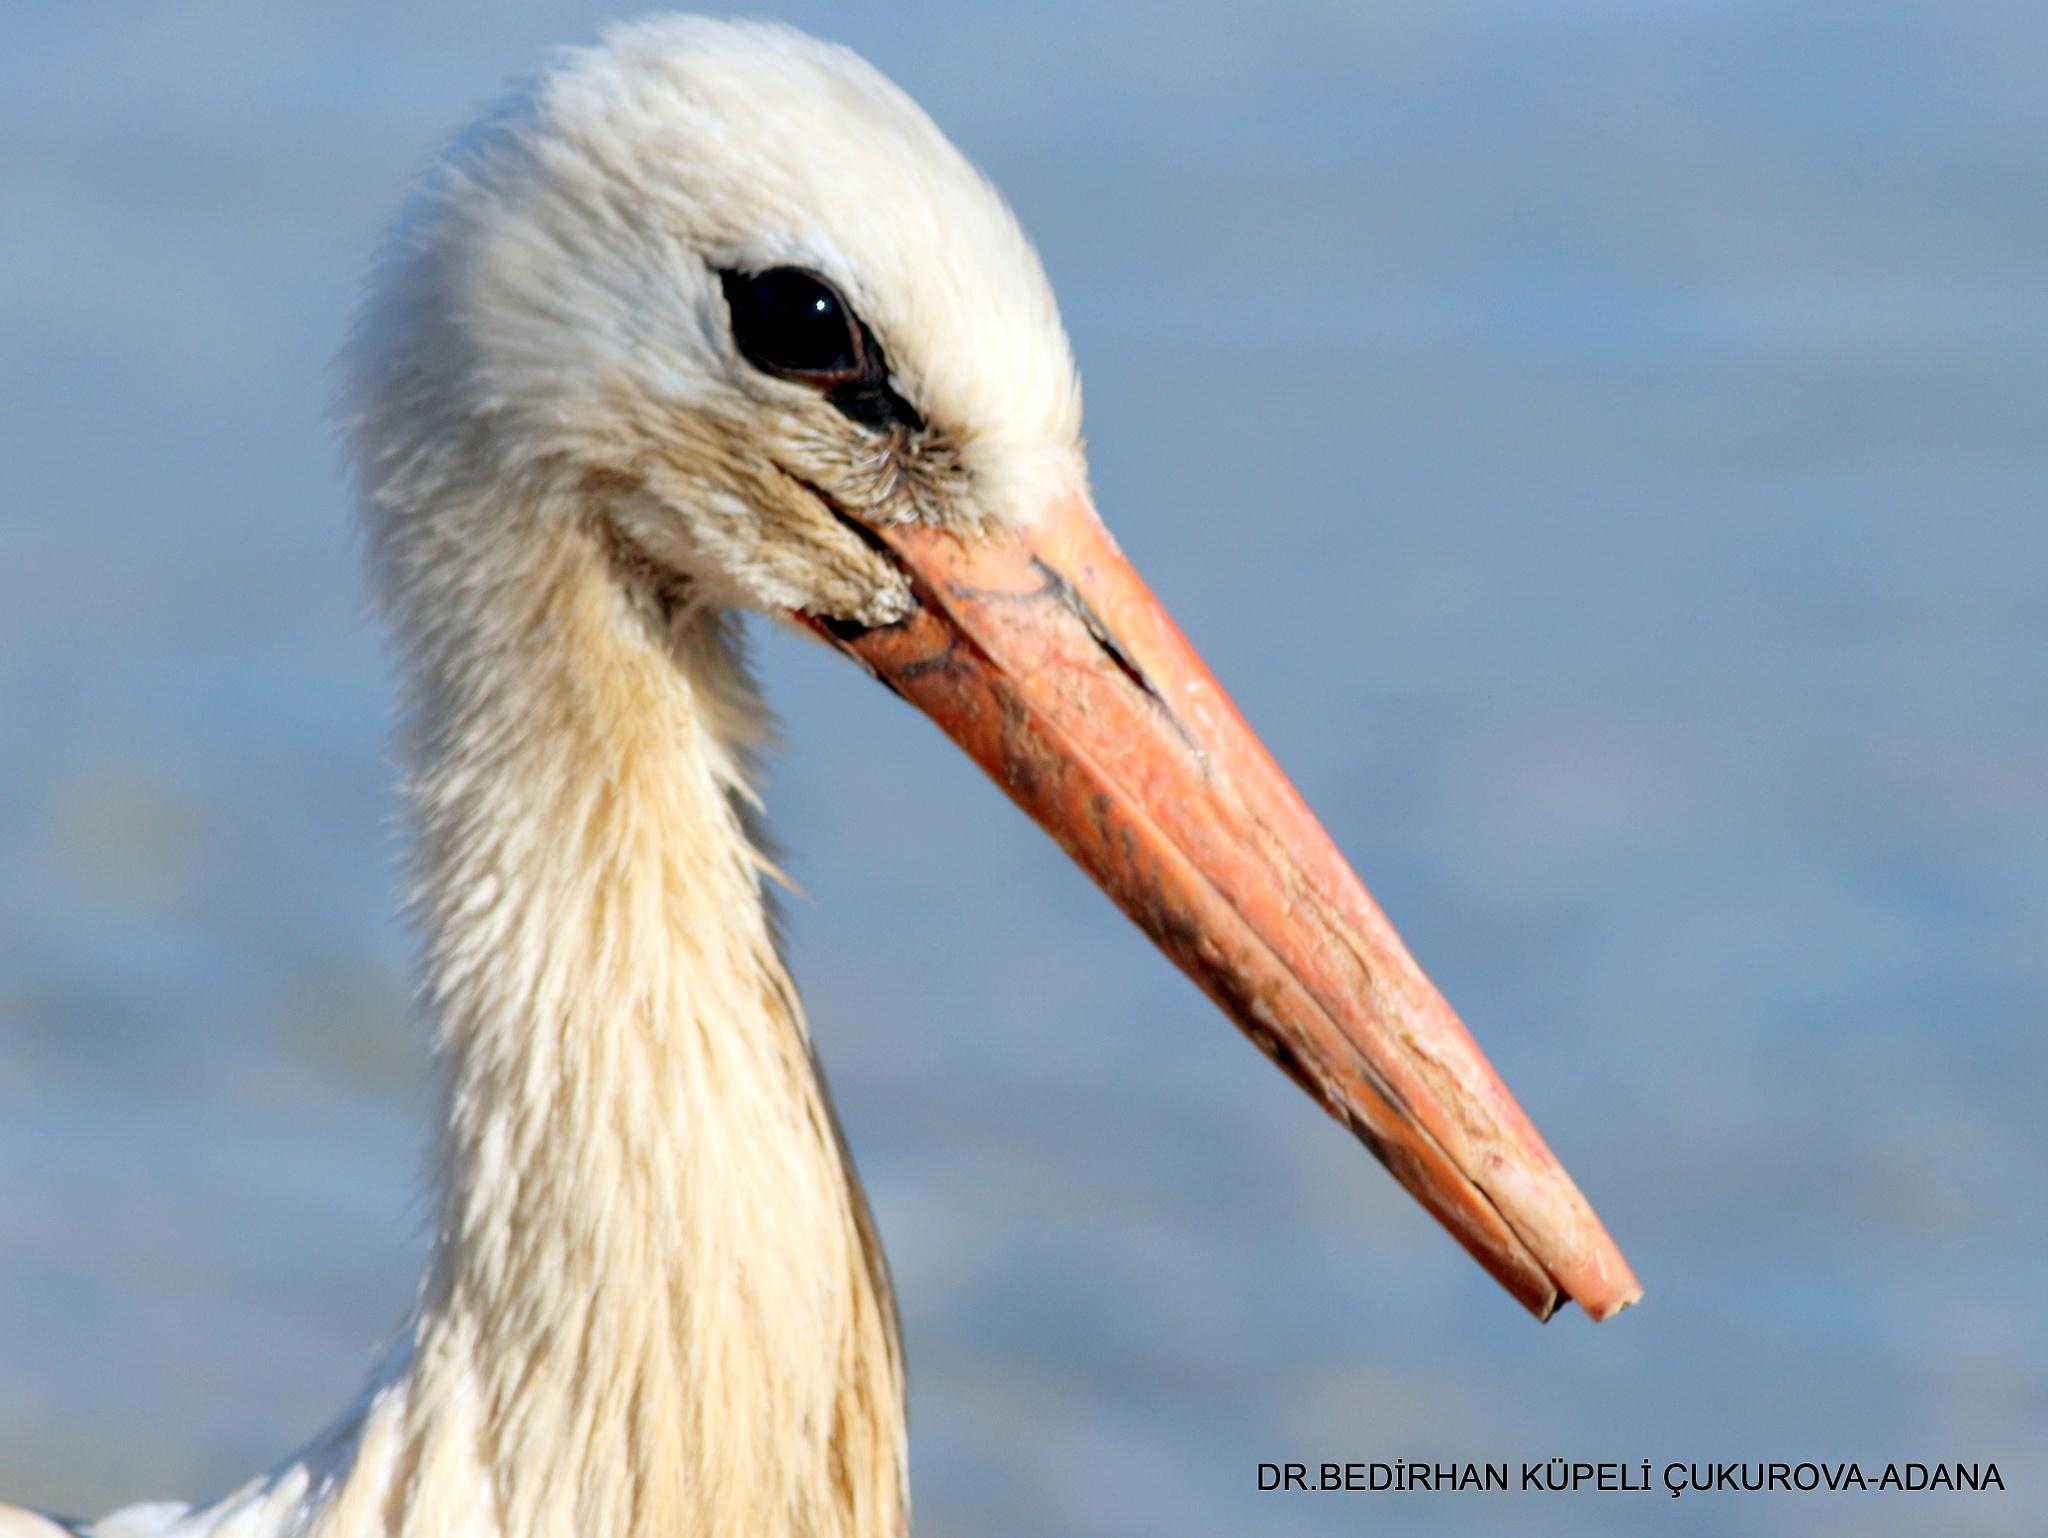 Broken-billed Stork by Bedirhan Küpeli